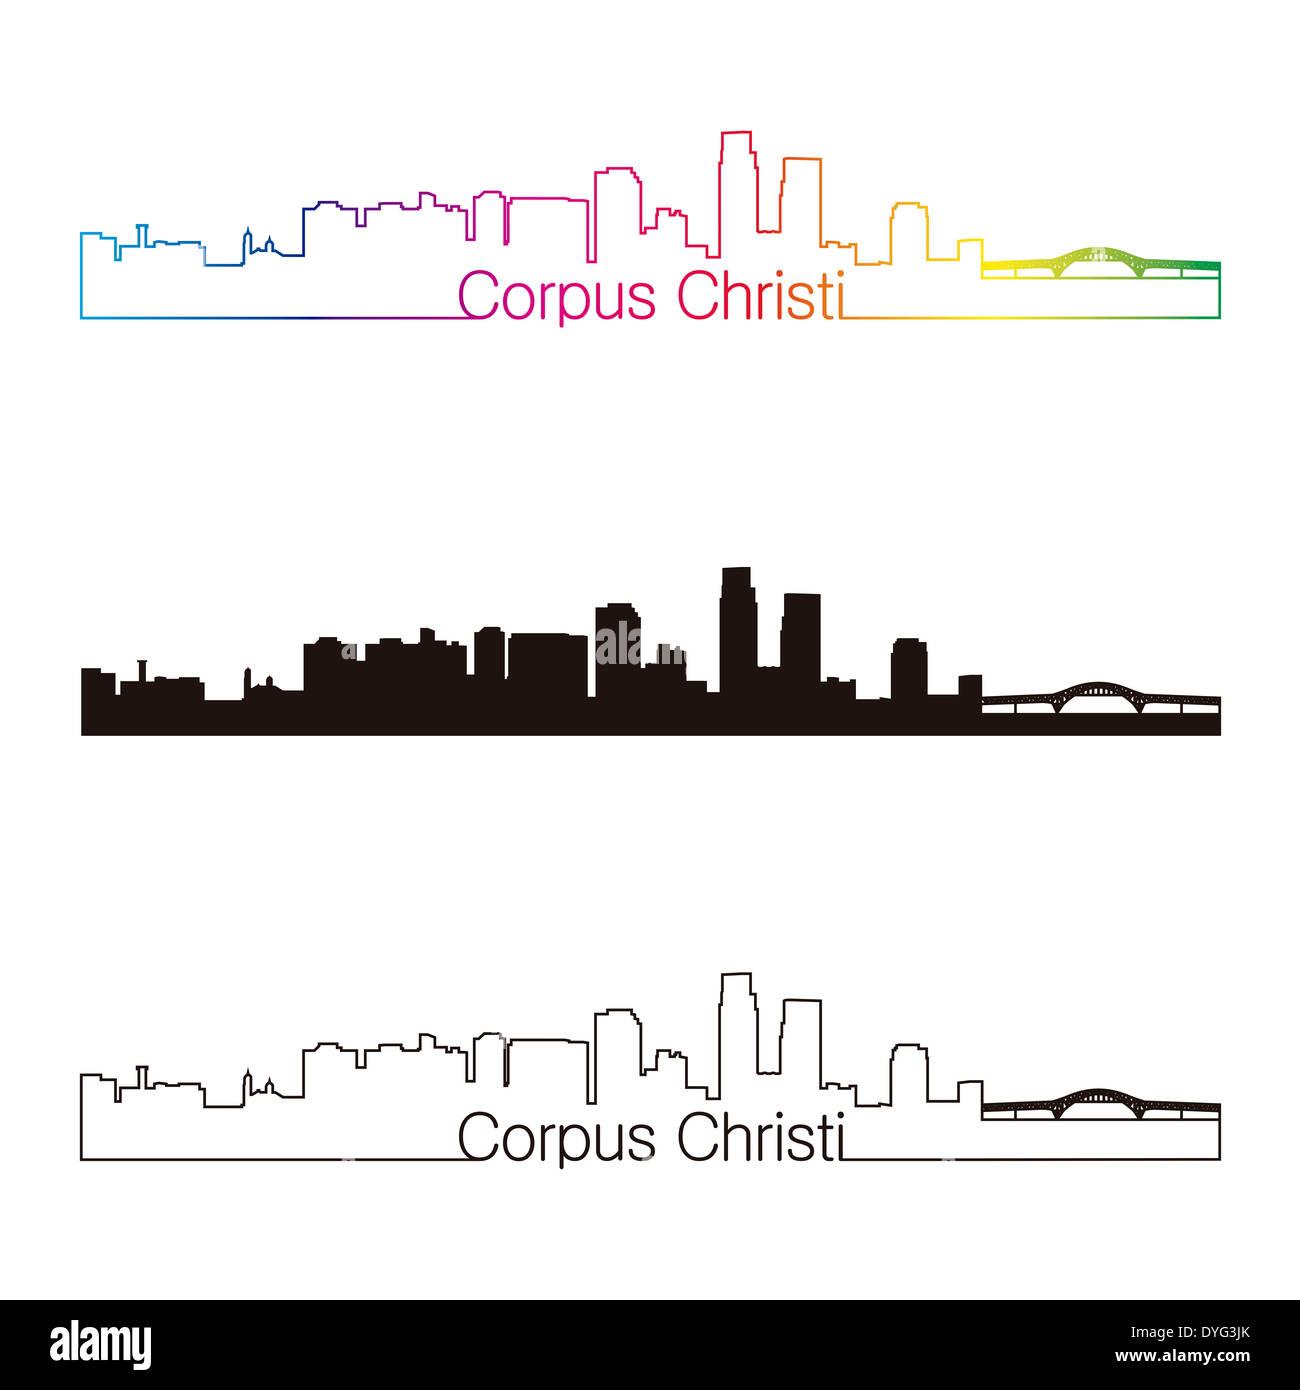 Corpus Christi skyline linear style - Stock Image